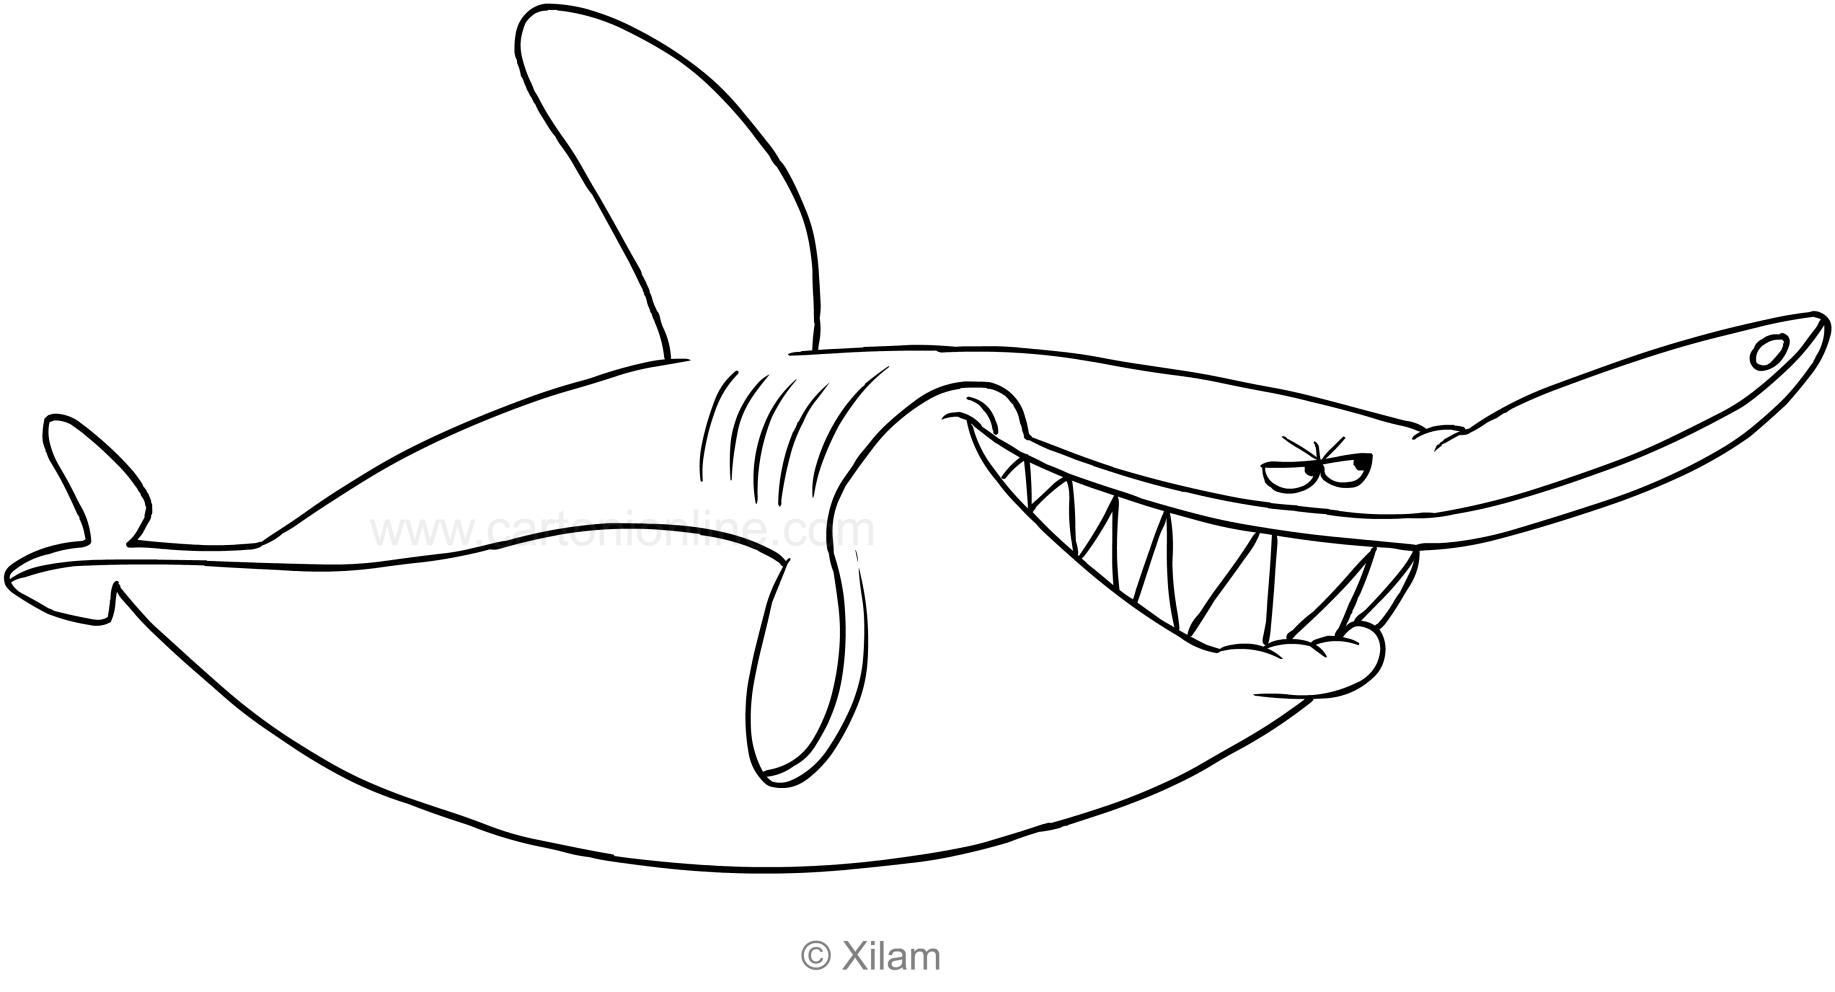 Coloriage De Sharko Le Requin